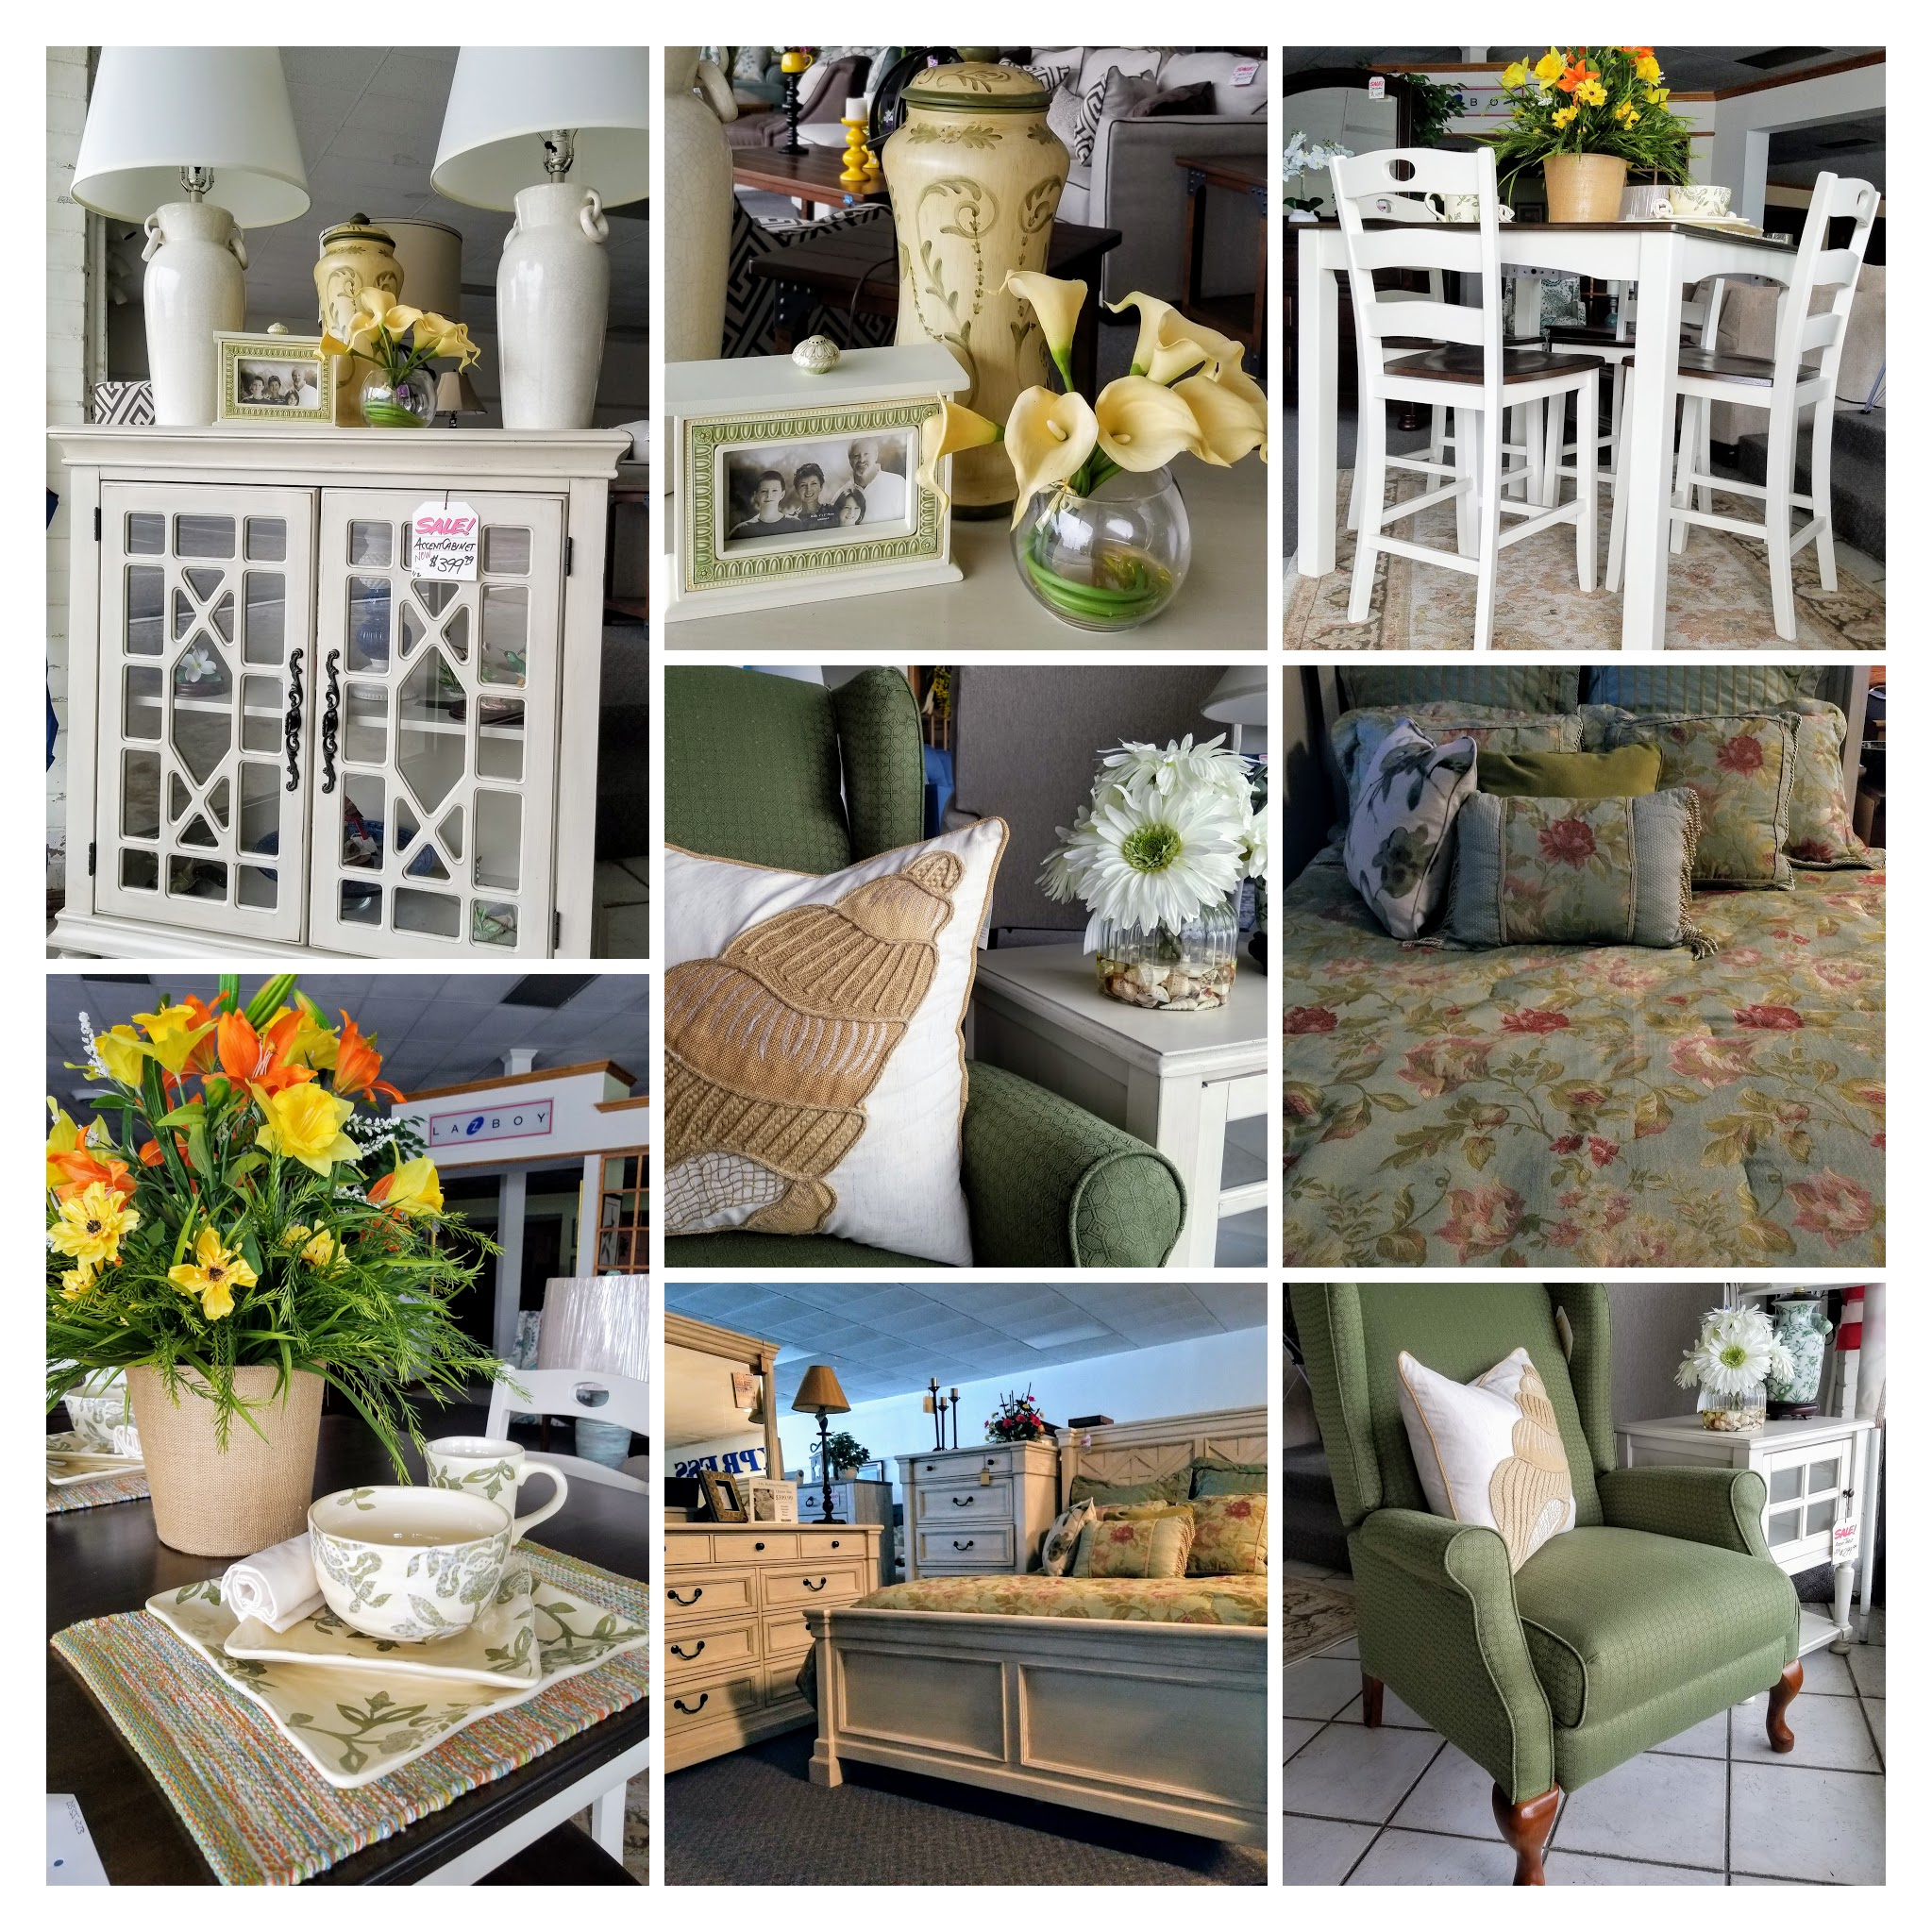 Tucker Furniture Smithfield 501 E Market St, Smithfield, NC 27577   YP.com